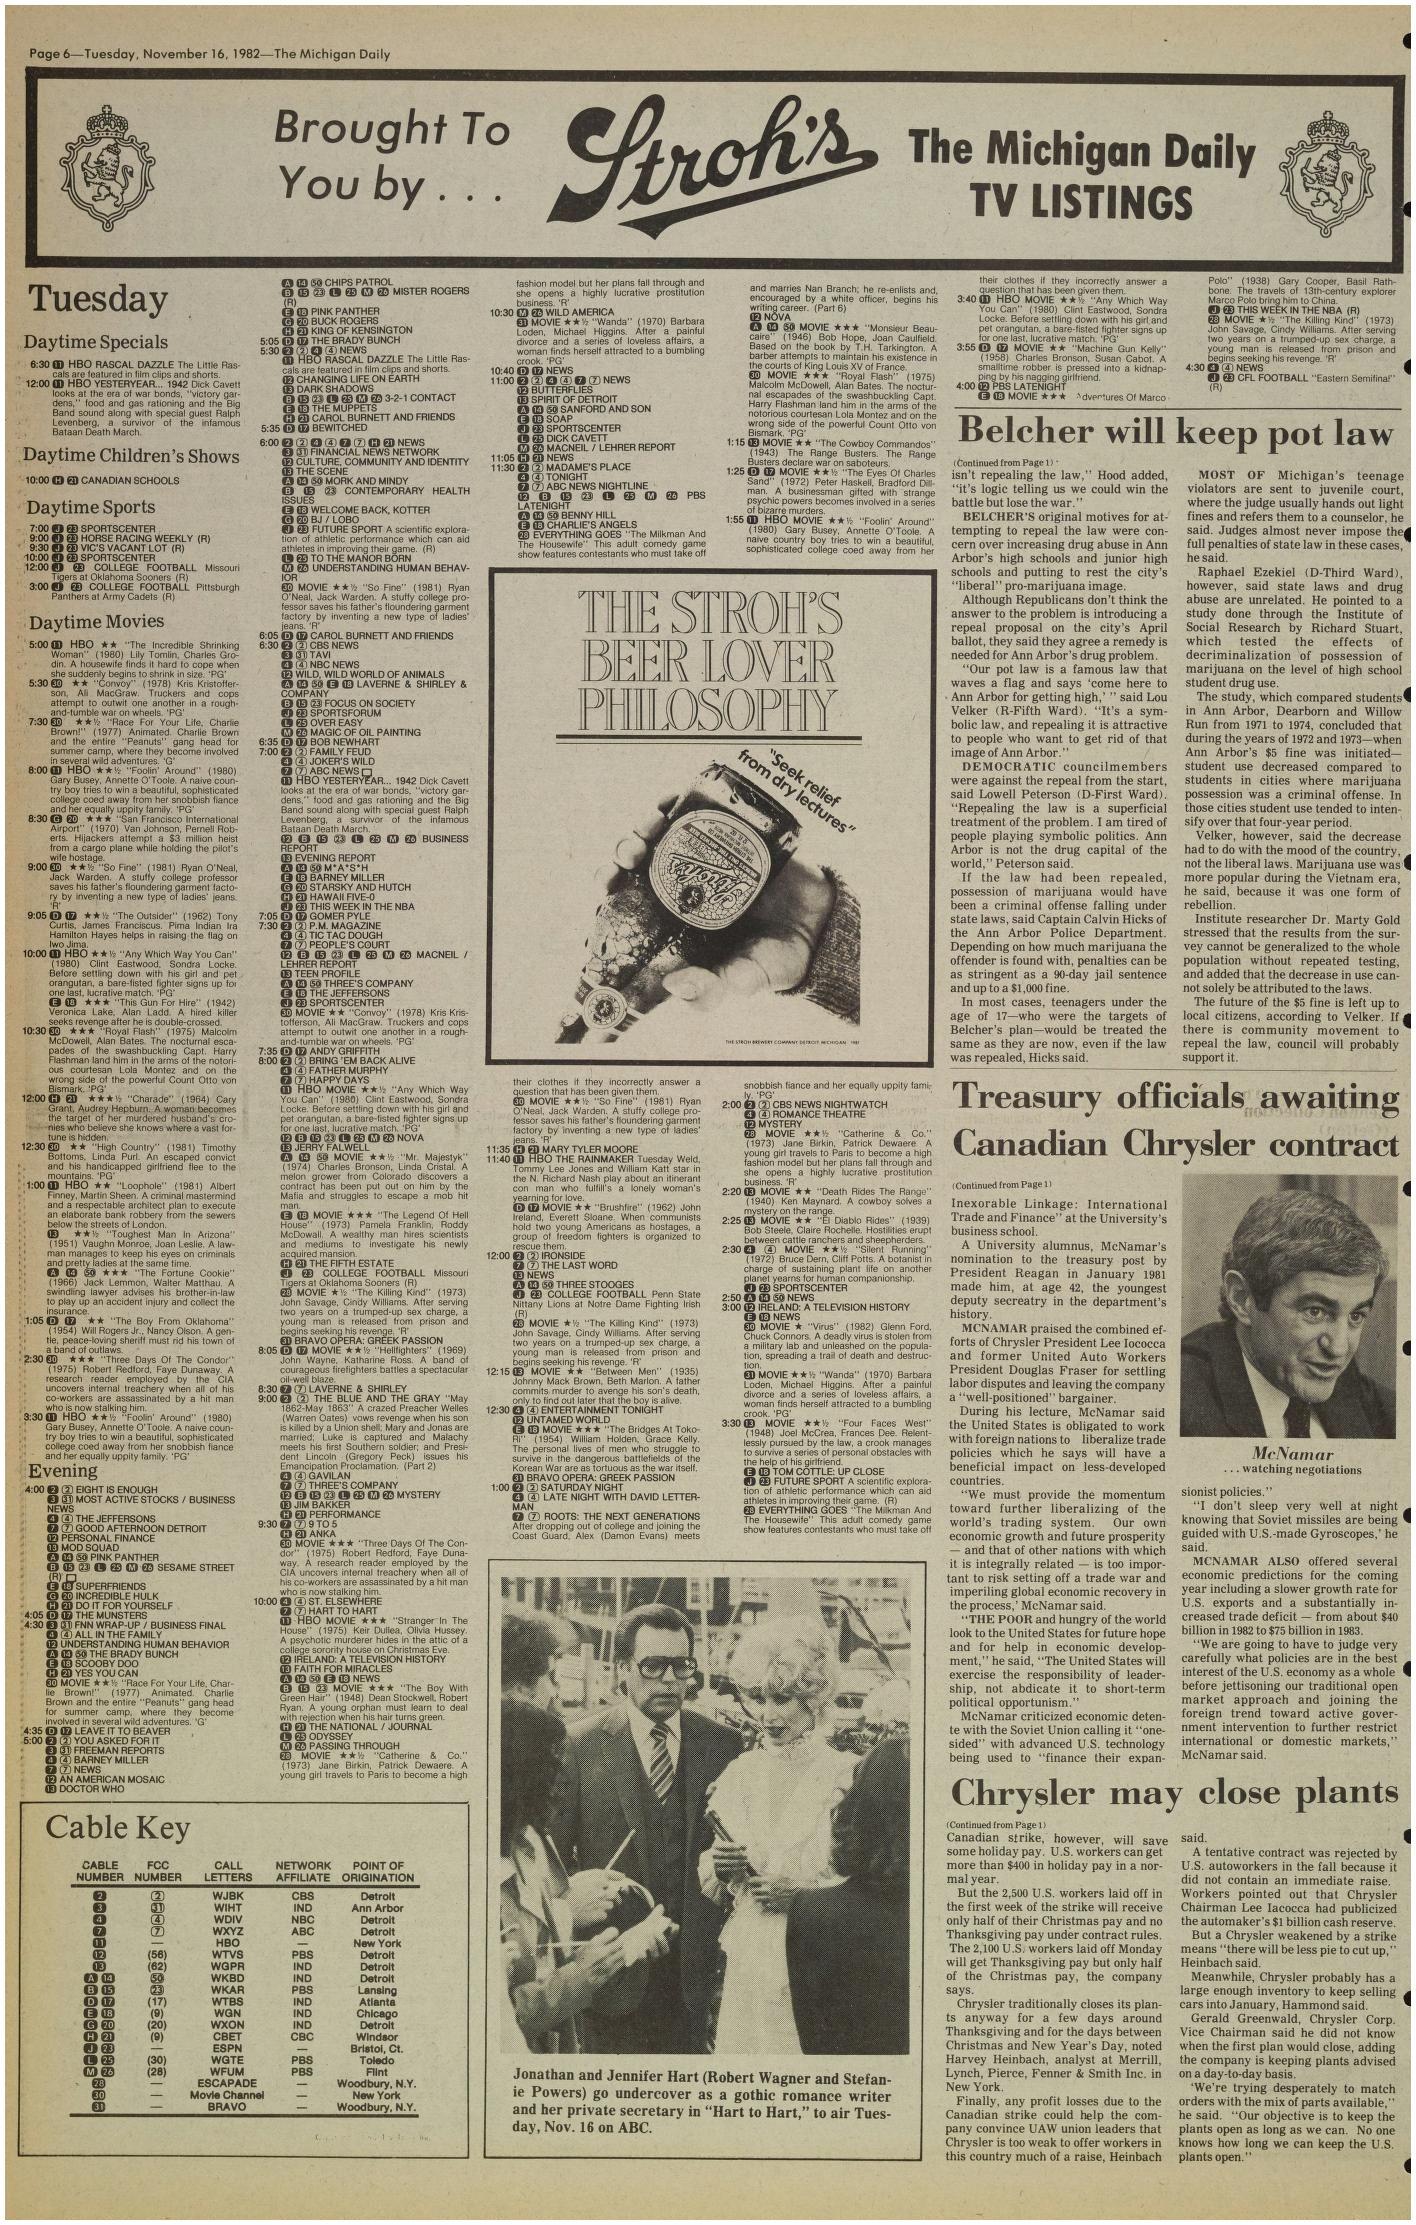 Atlanta Business Journal Magazine Michigan Daily Digital Archives November 16 1982 Vol 93 iss